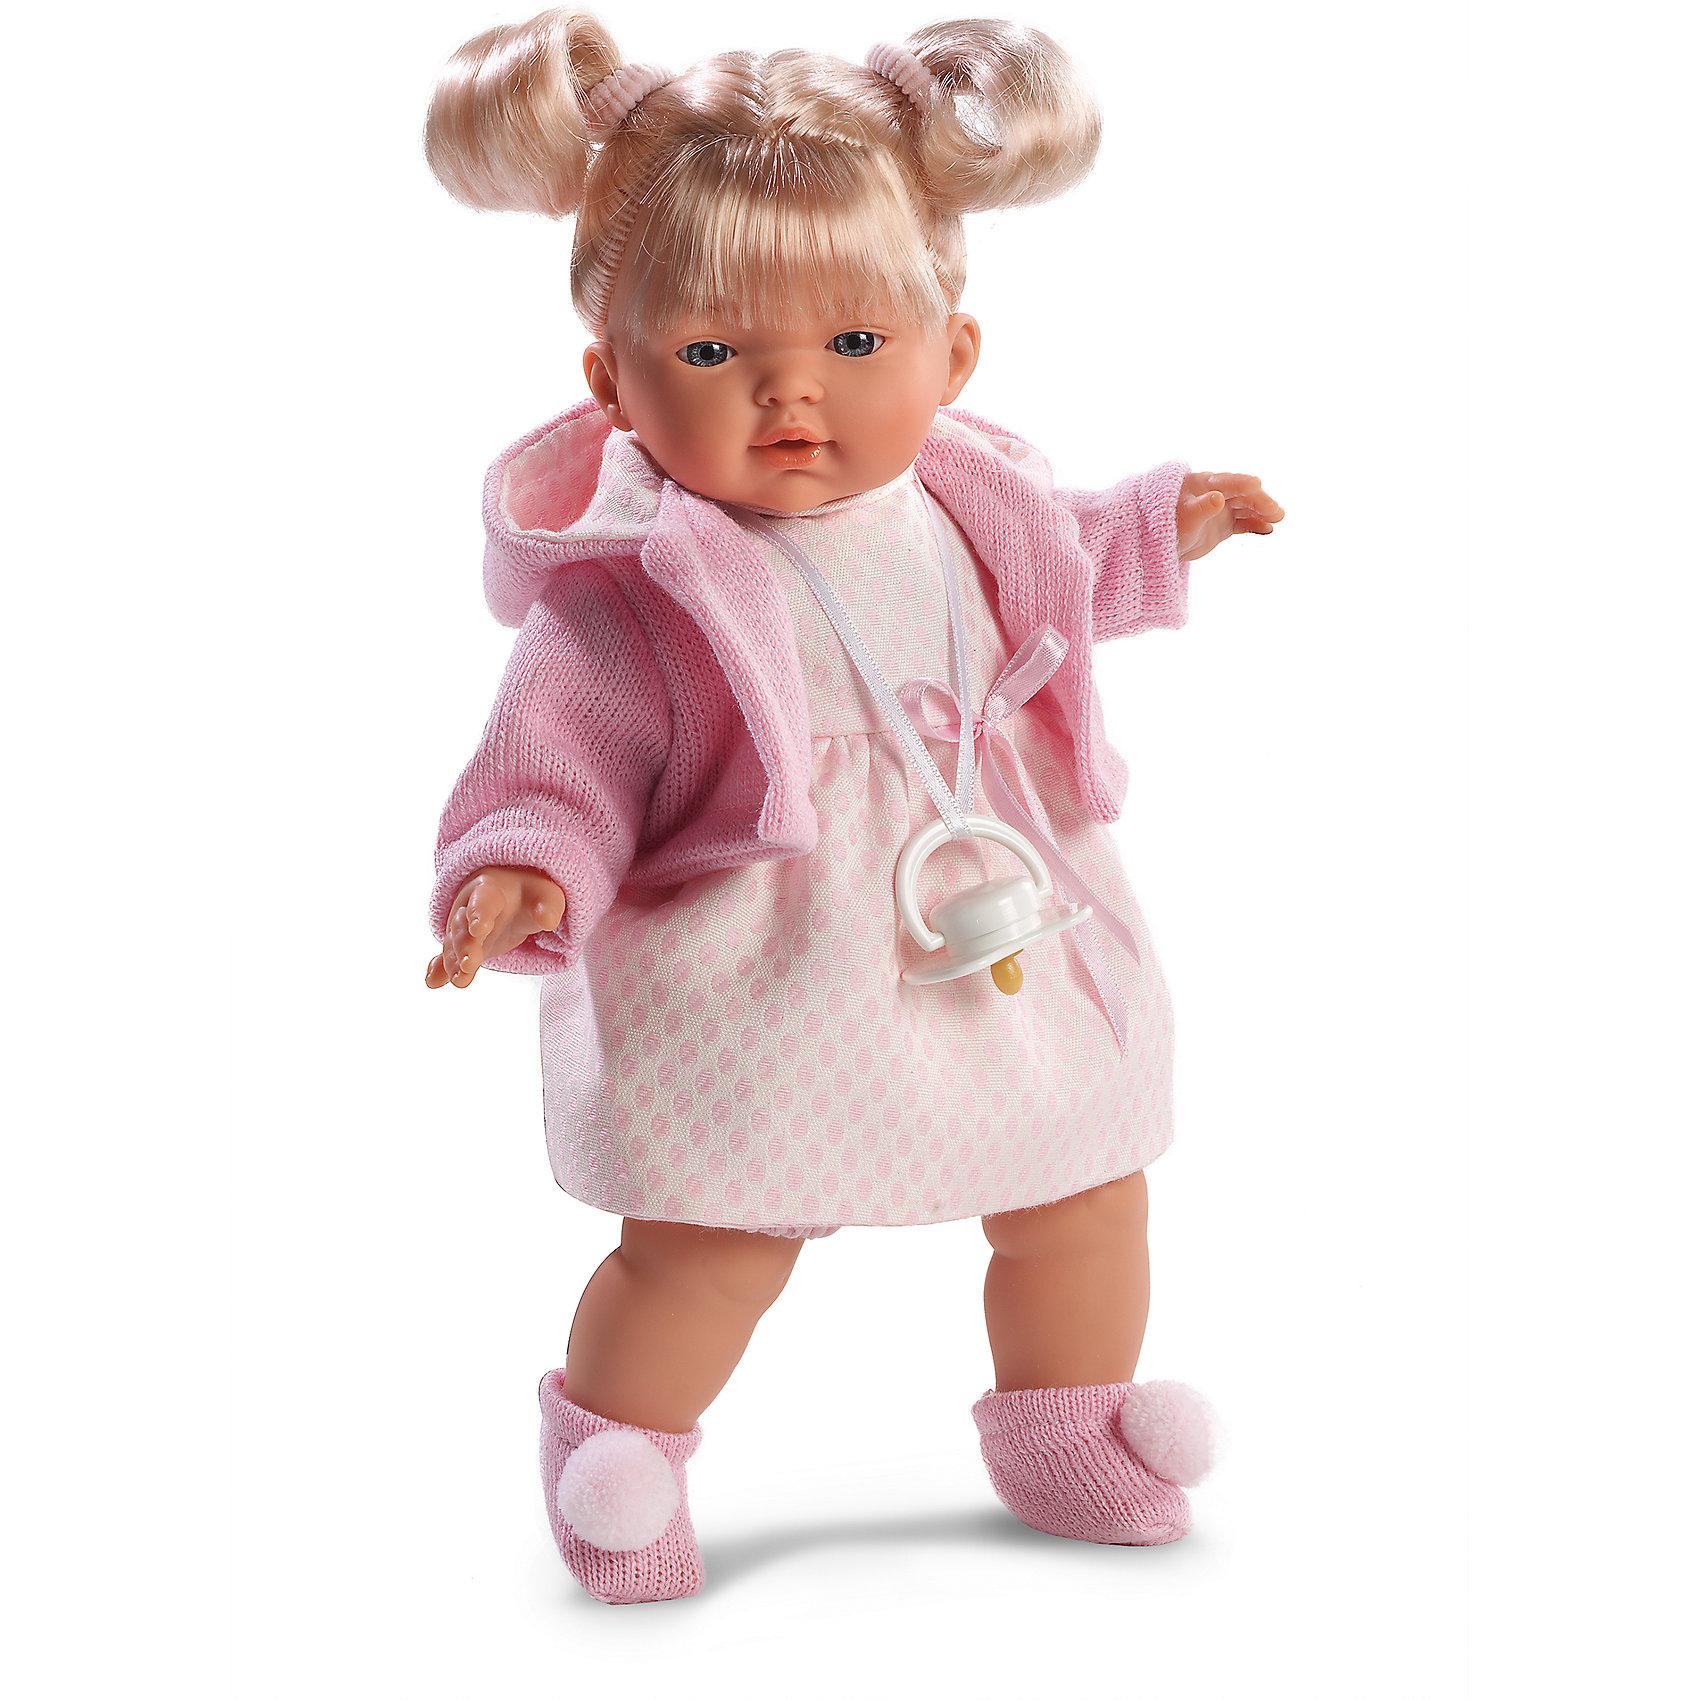 Llorens Кукла Мария, 33 см, Llorens куклы и одежда для кукол llorens кукла алиса 33 см со звуком